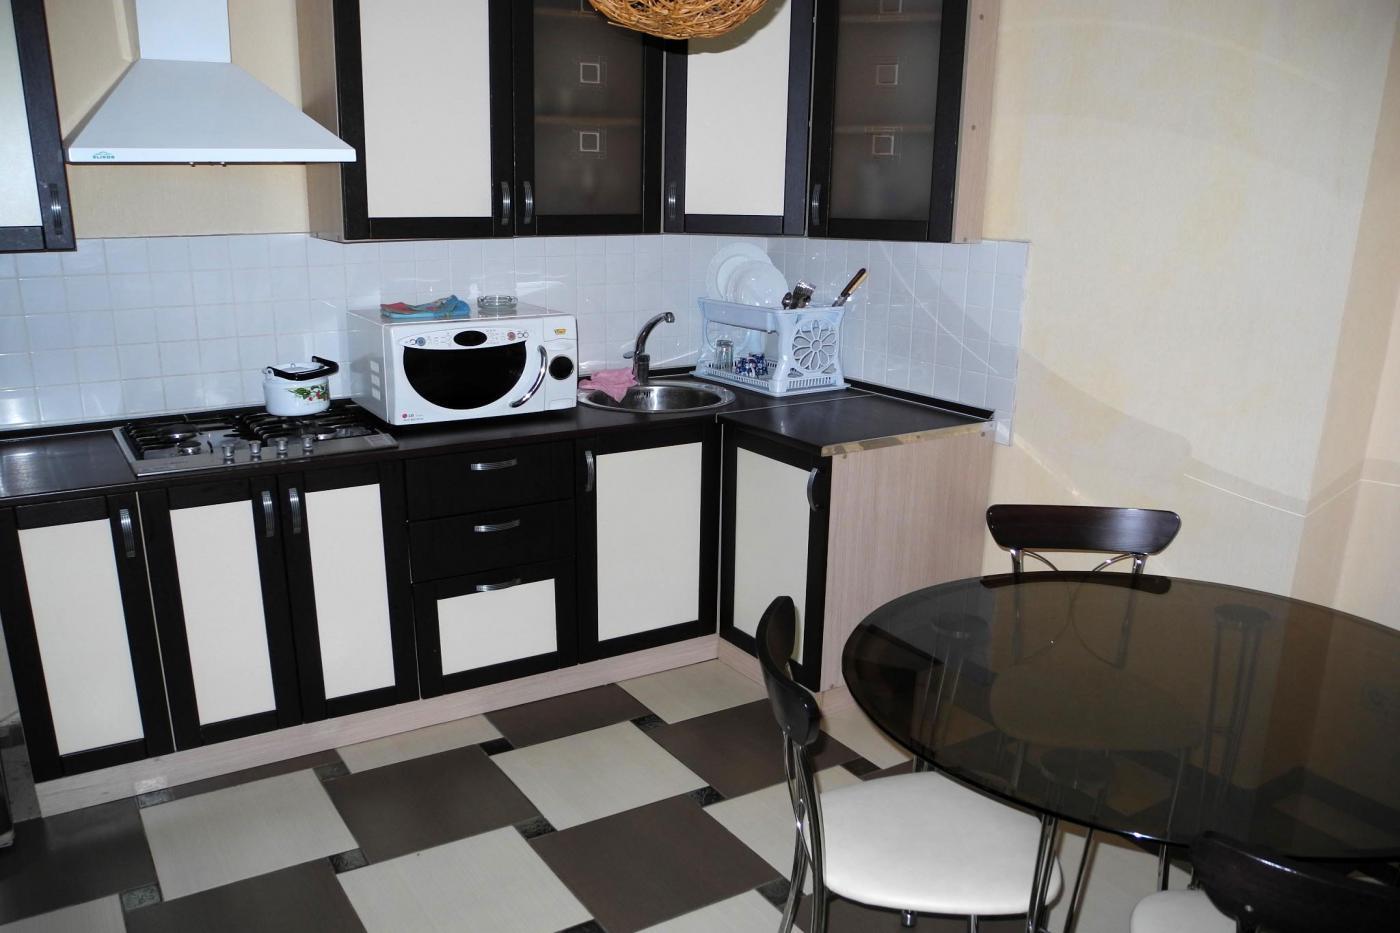 2-комнатная квартира посуточно (вариант № 3876), ул. Войкова улица, фото № 10